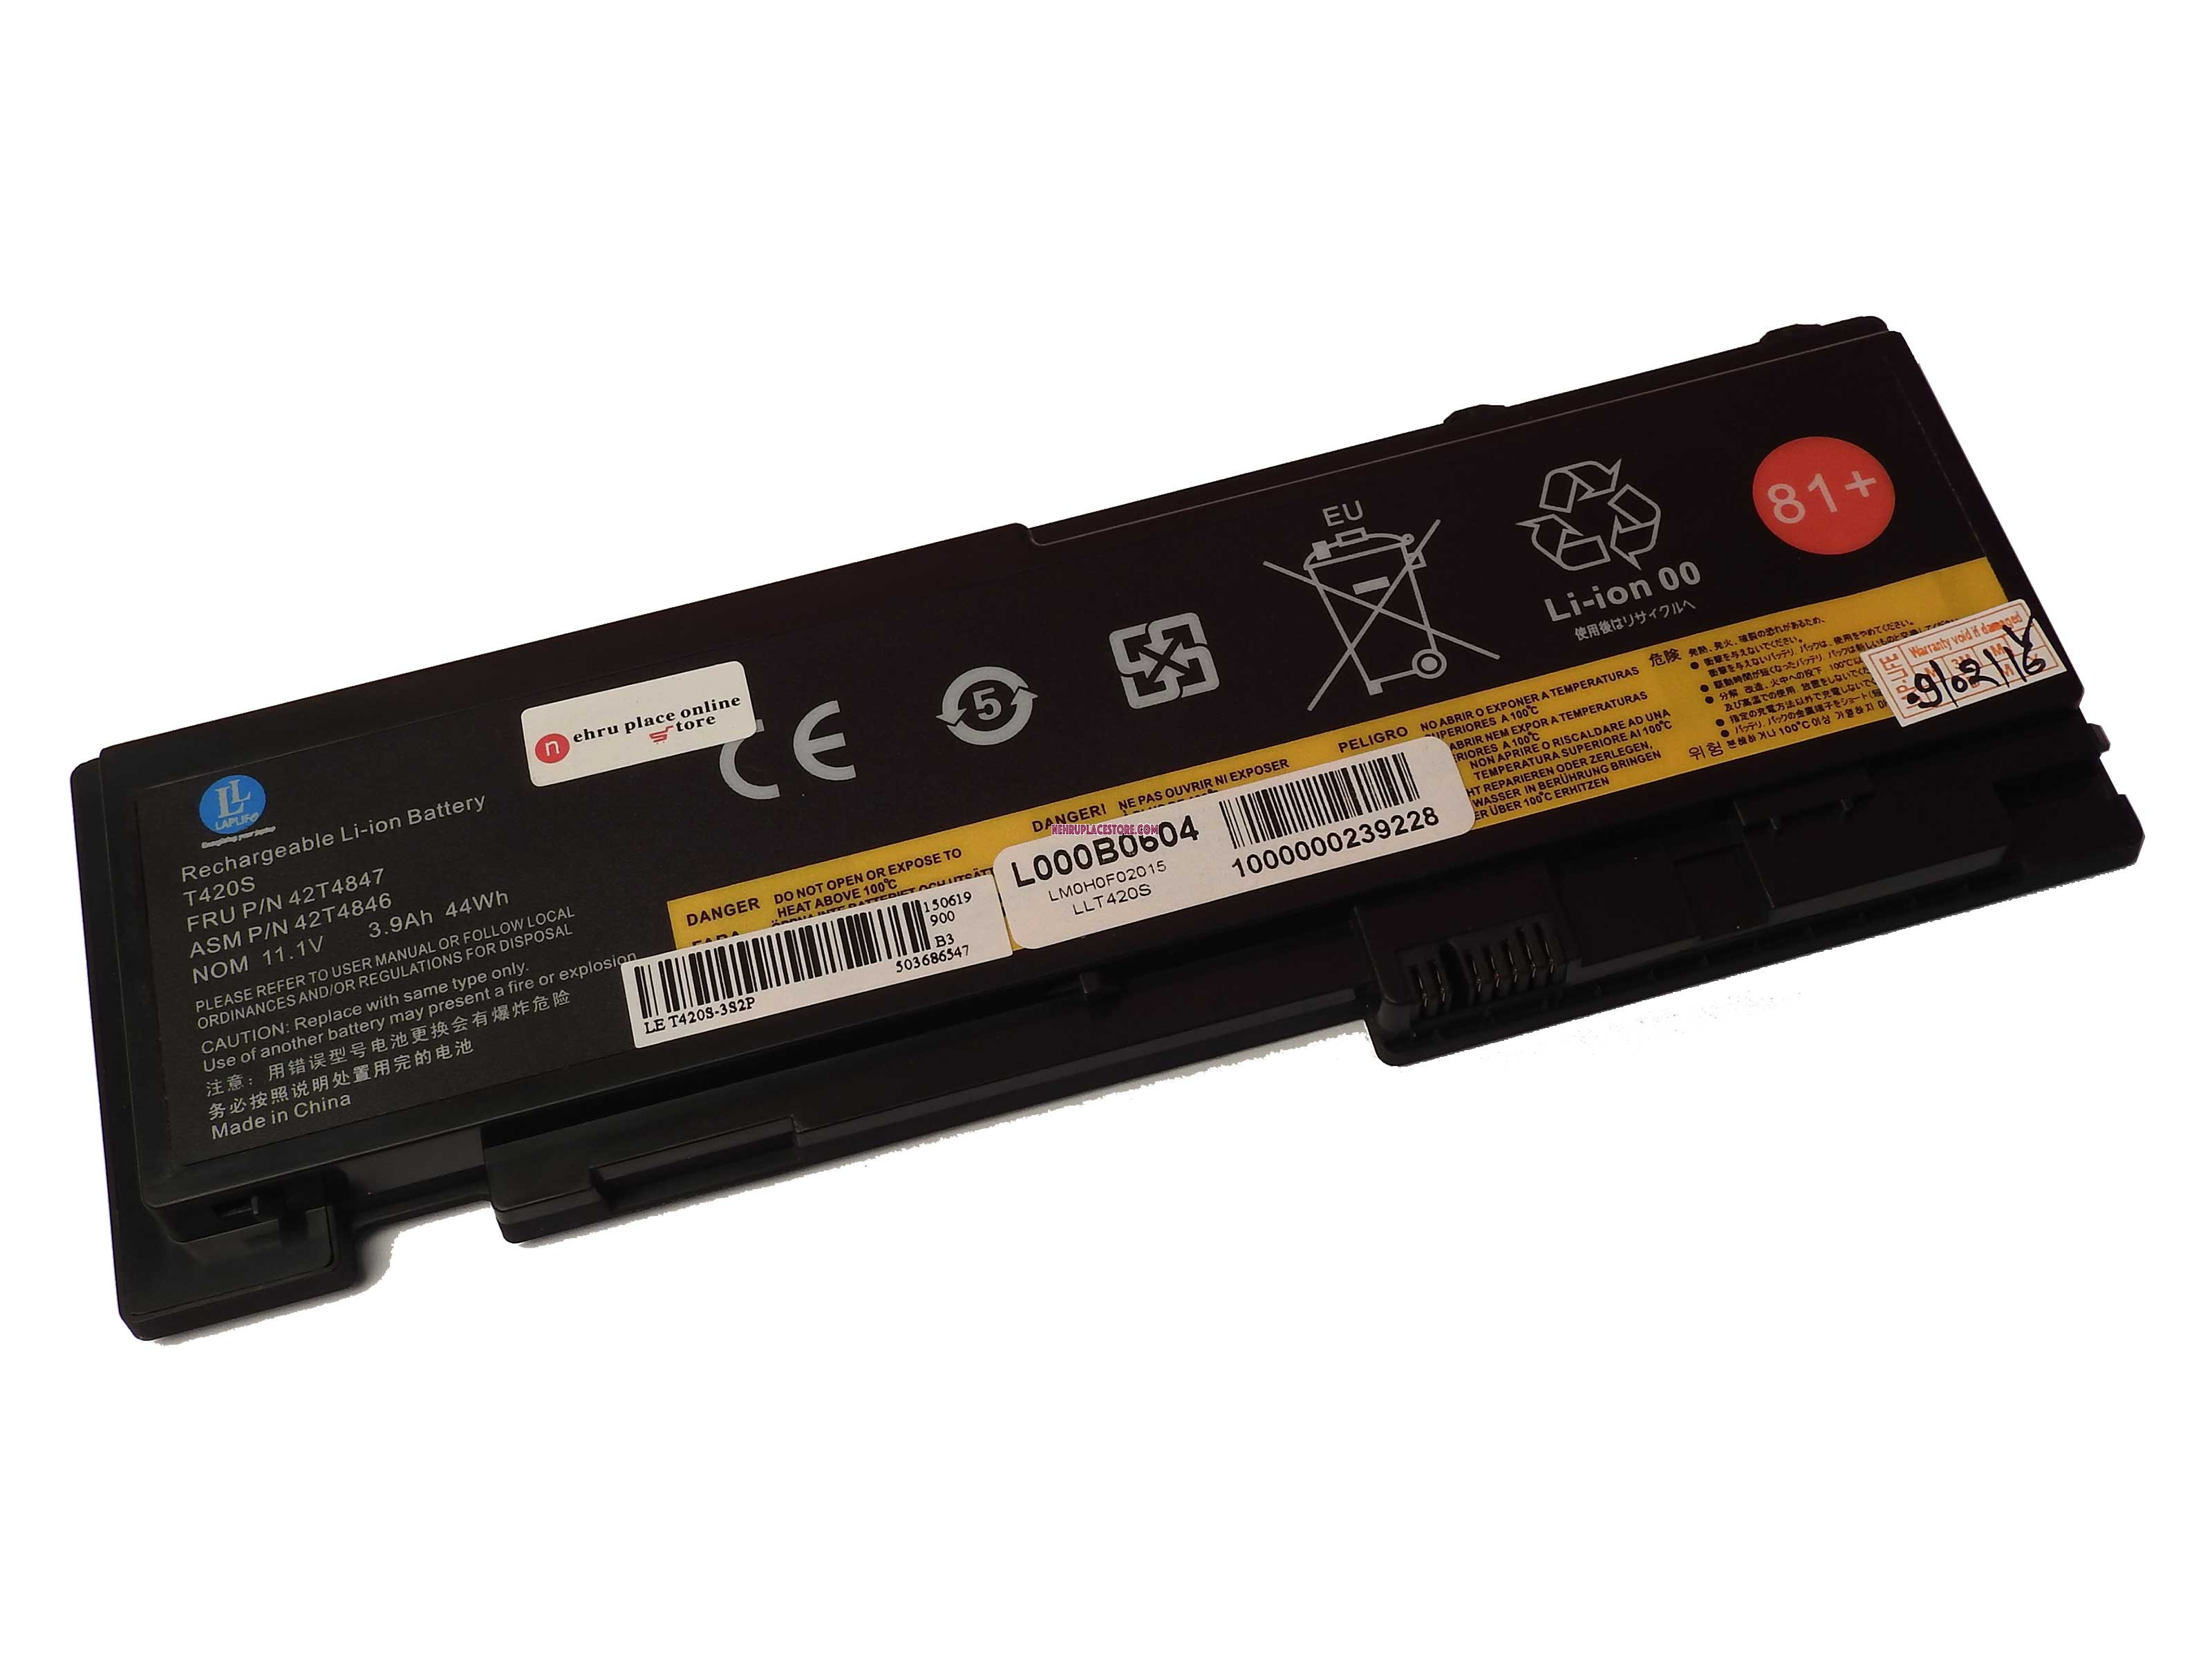 Laplife Lenovo Laptop Battery - Lenovo - Laptop Battery